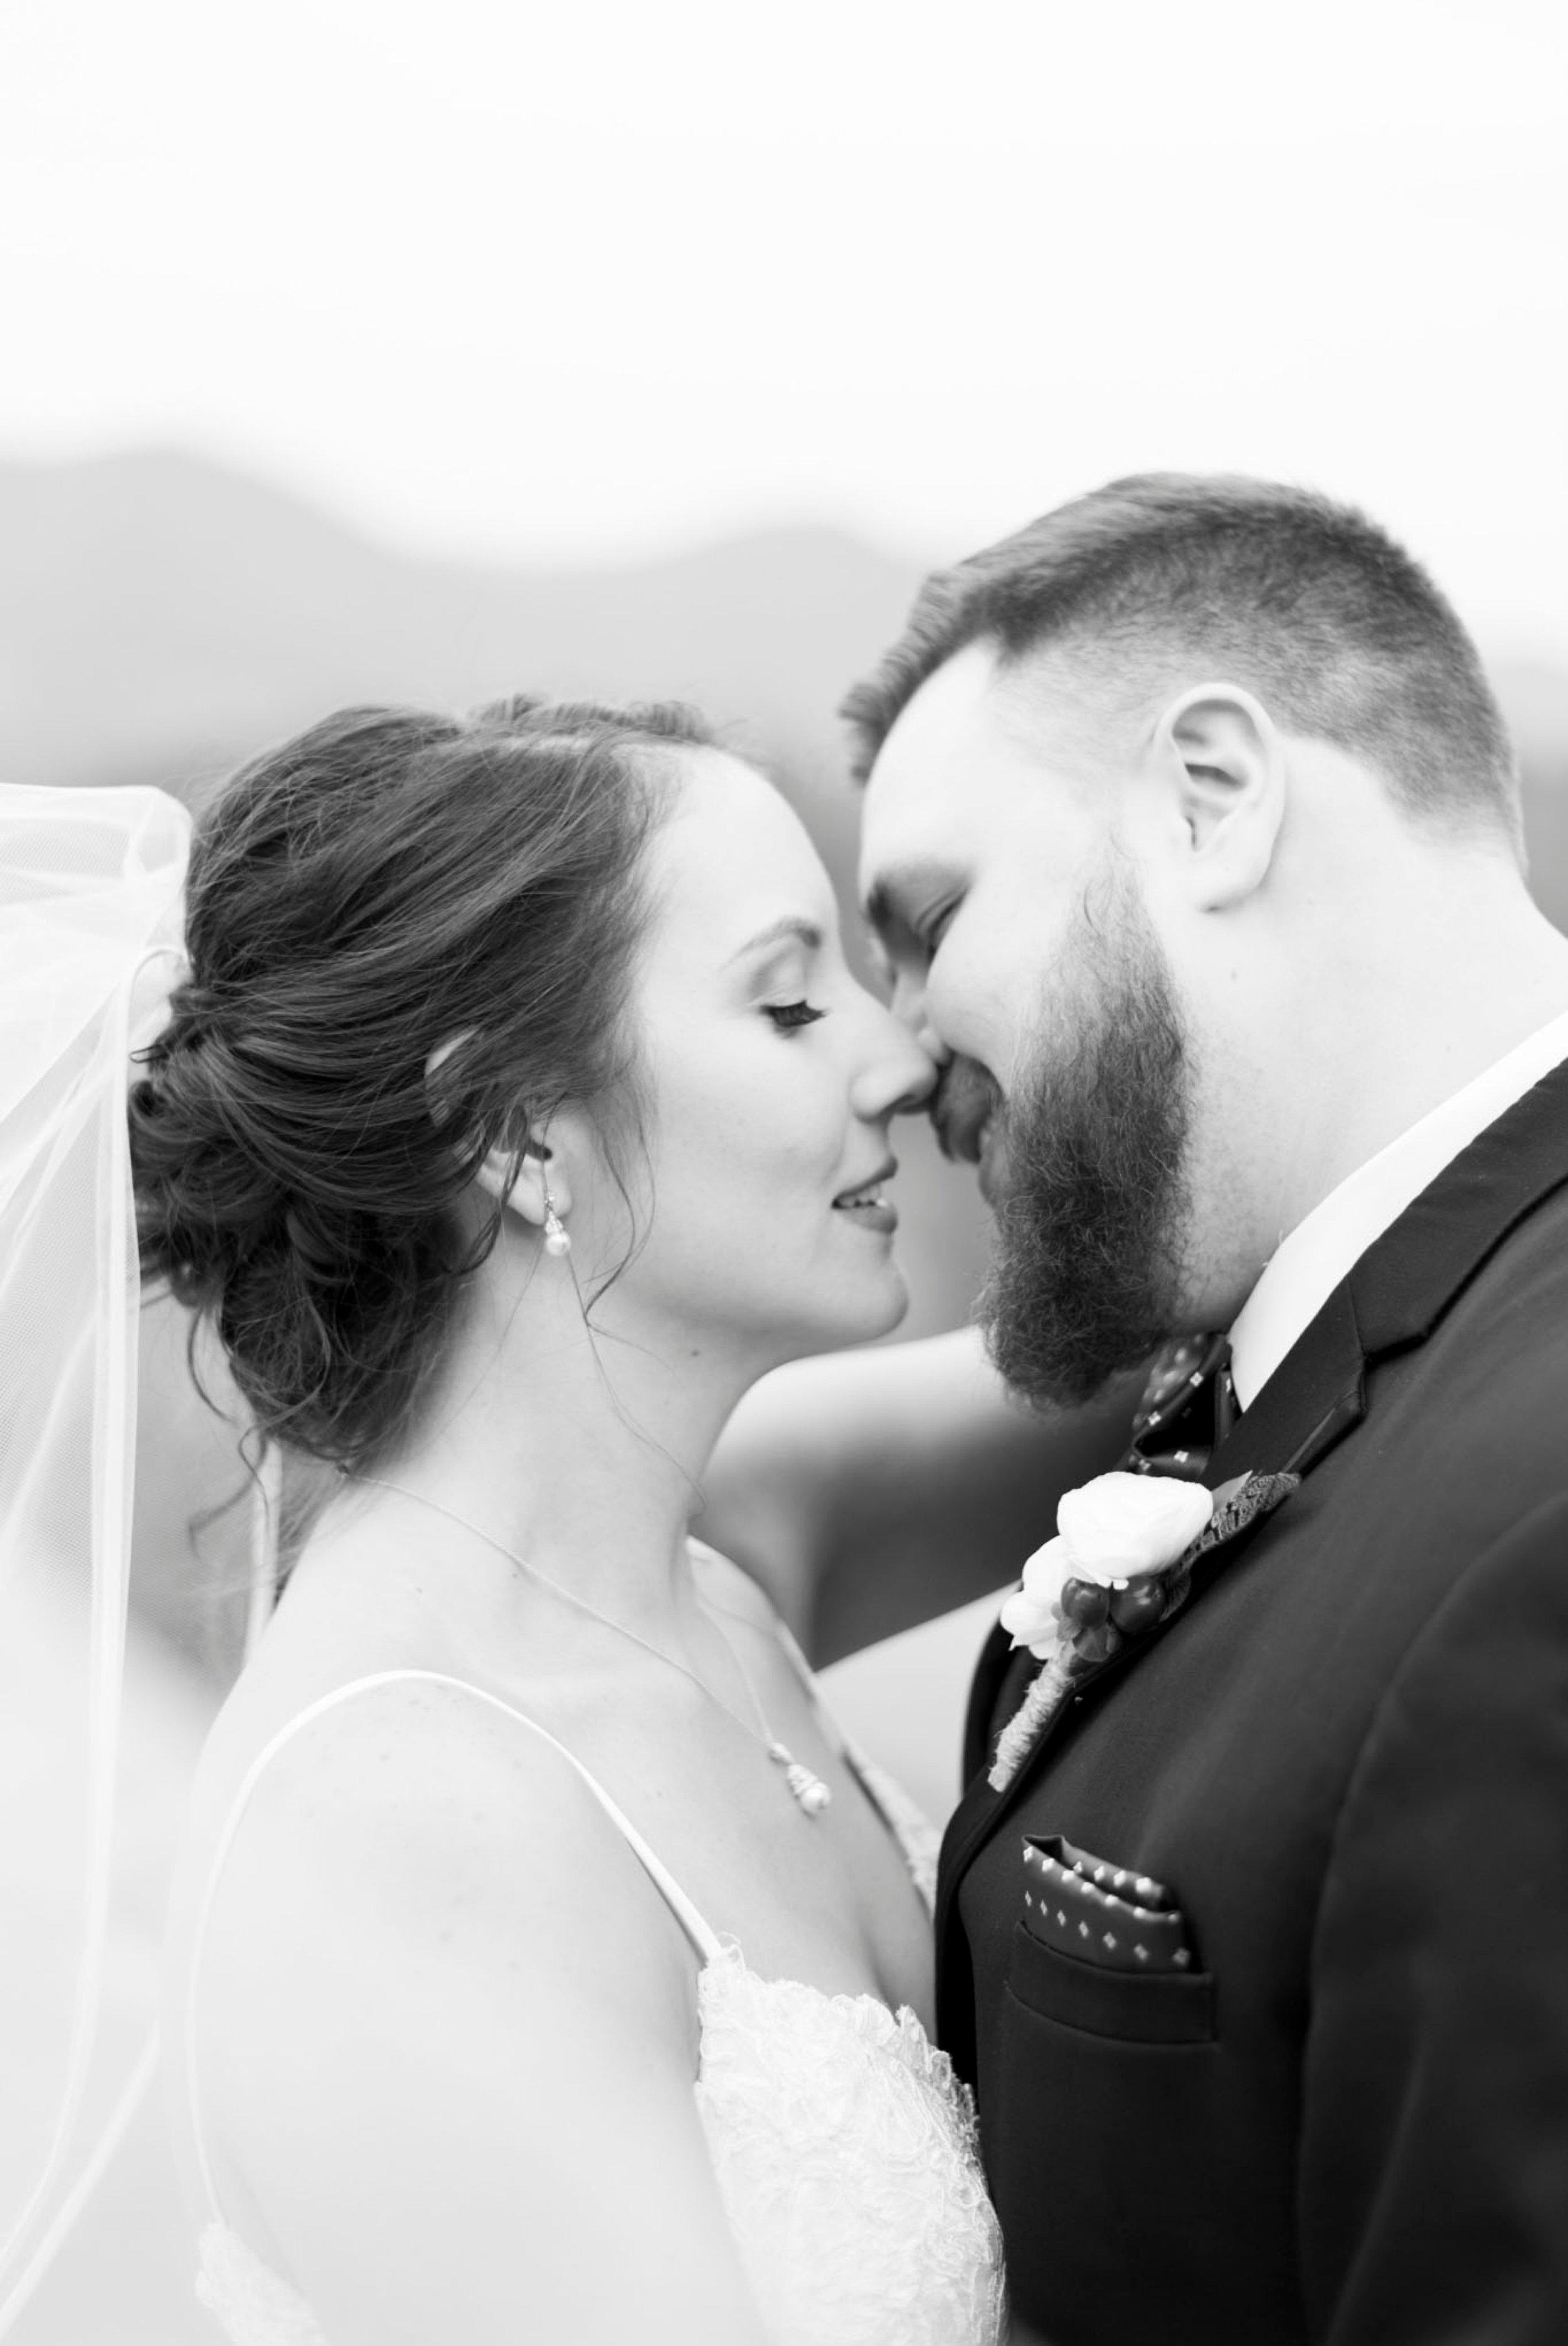 IrvineEstate_LexingtonVA_Wedding_FallWedding_VirginiaWeddingPhotographer 95.jpg